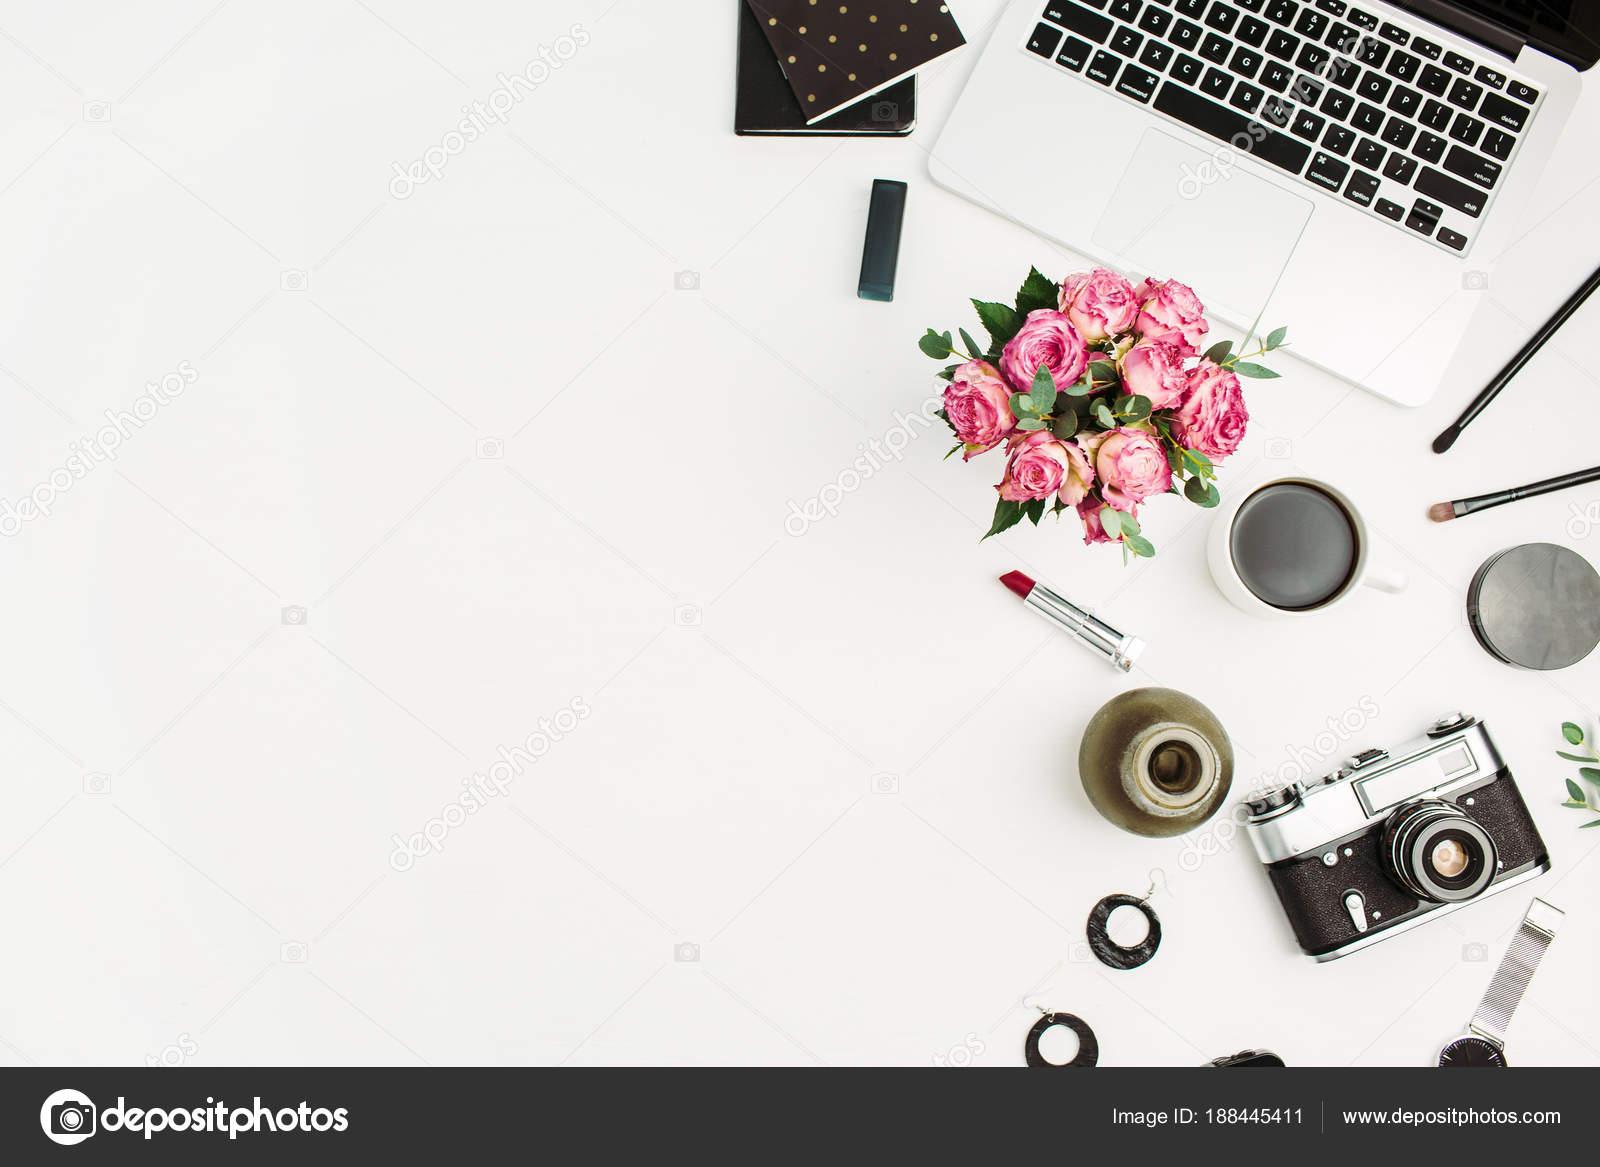 Frau Home Office Arbeitsplatz Mit Laptop Rosen Blumen Bukett ...